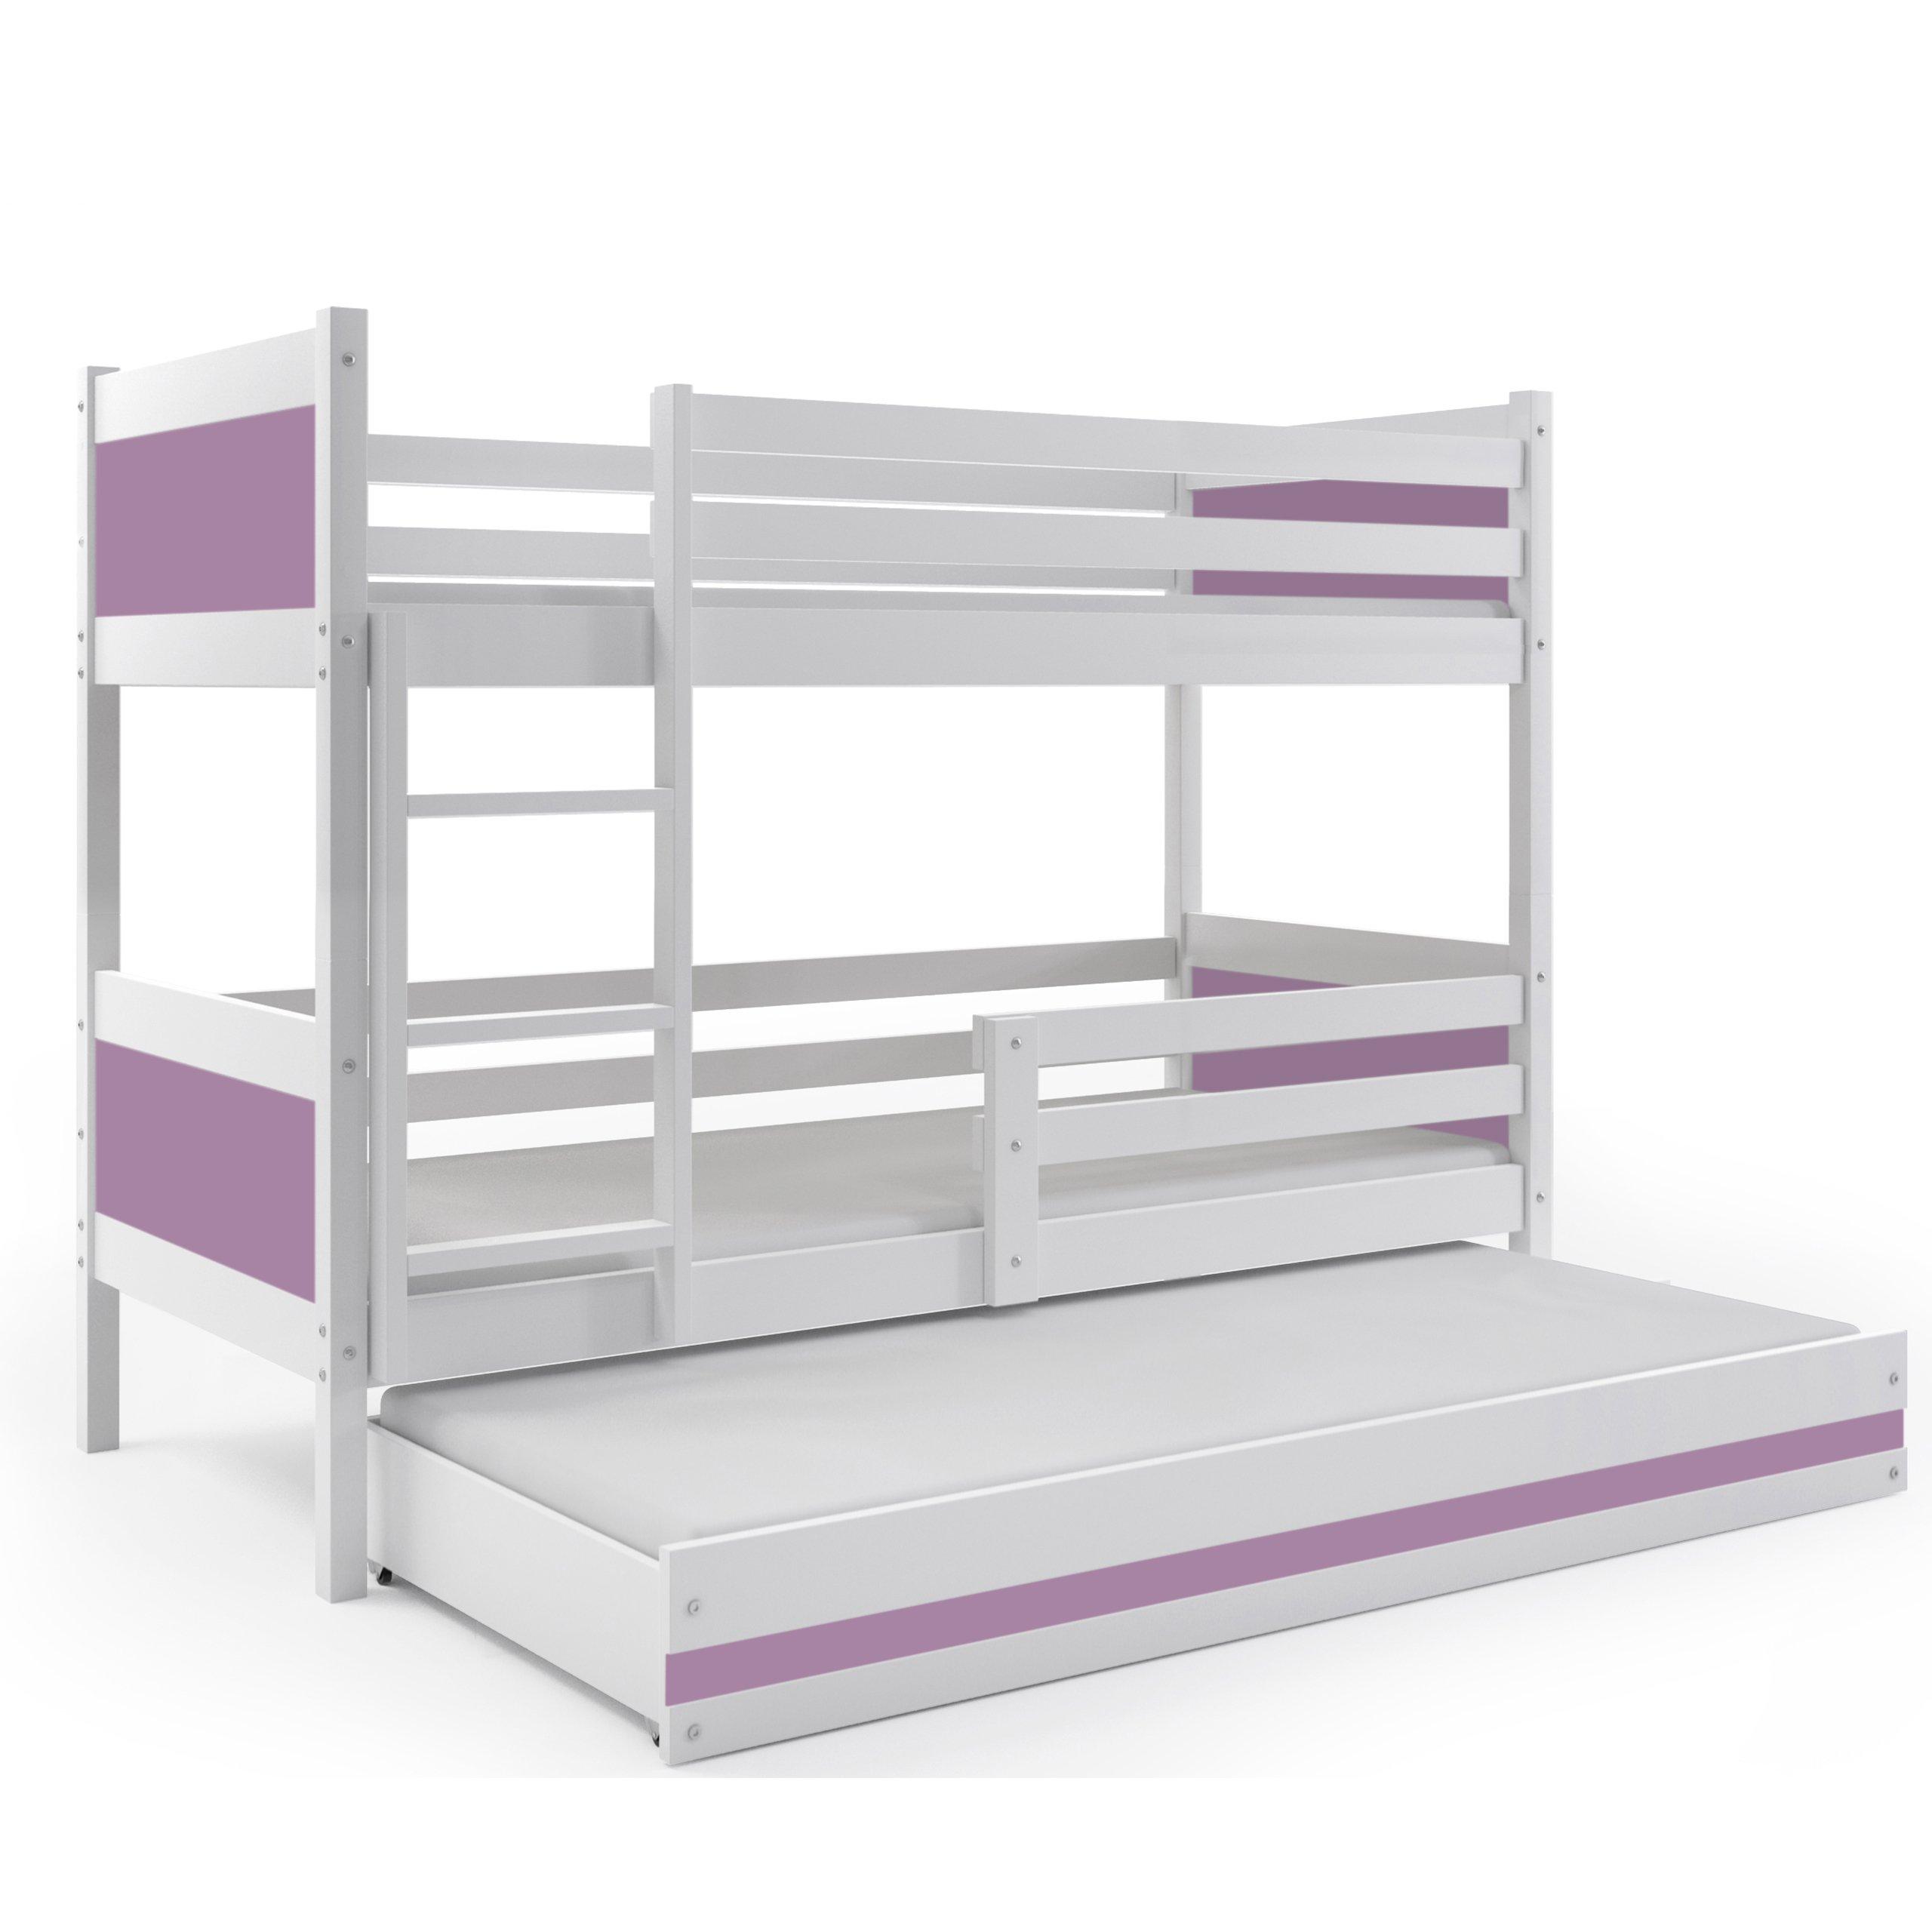 BMS Group LITERA Infantil Triple (3 Camas) 190x80, Color Blanco (LOS Paneles